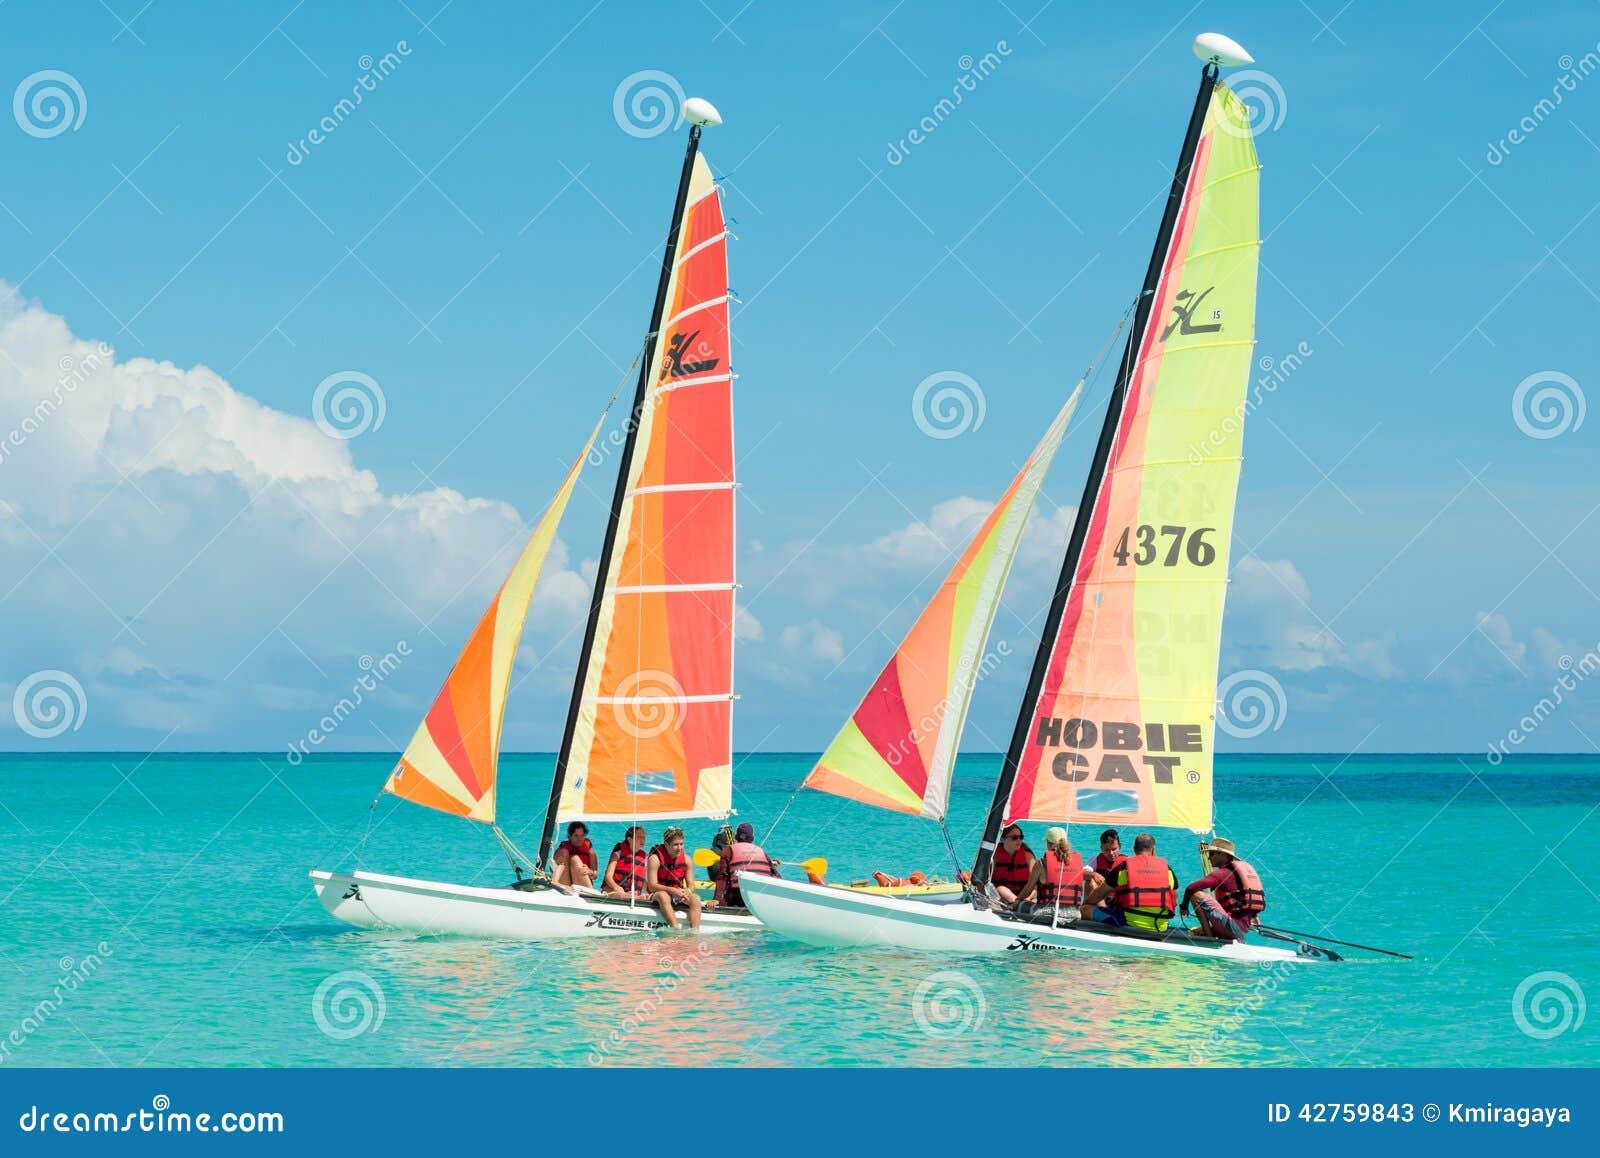 Tourists Sailing In Cayo Santa Maria In Cuba Editorial Stock Photo - Image: 42759843